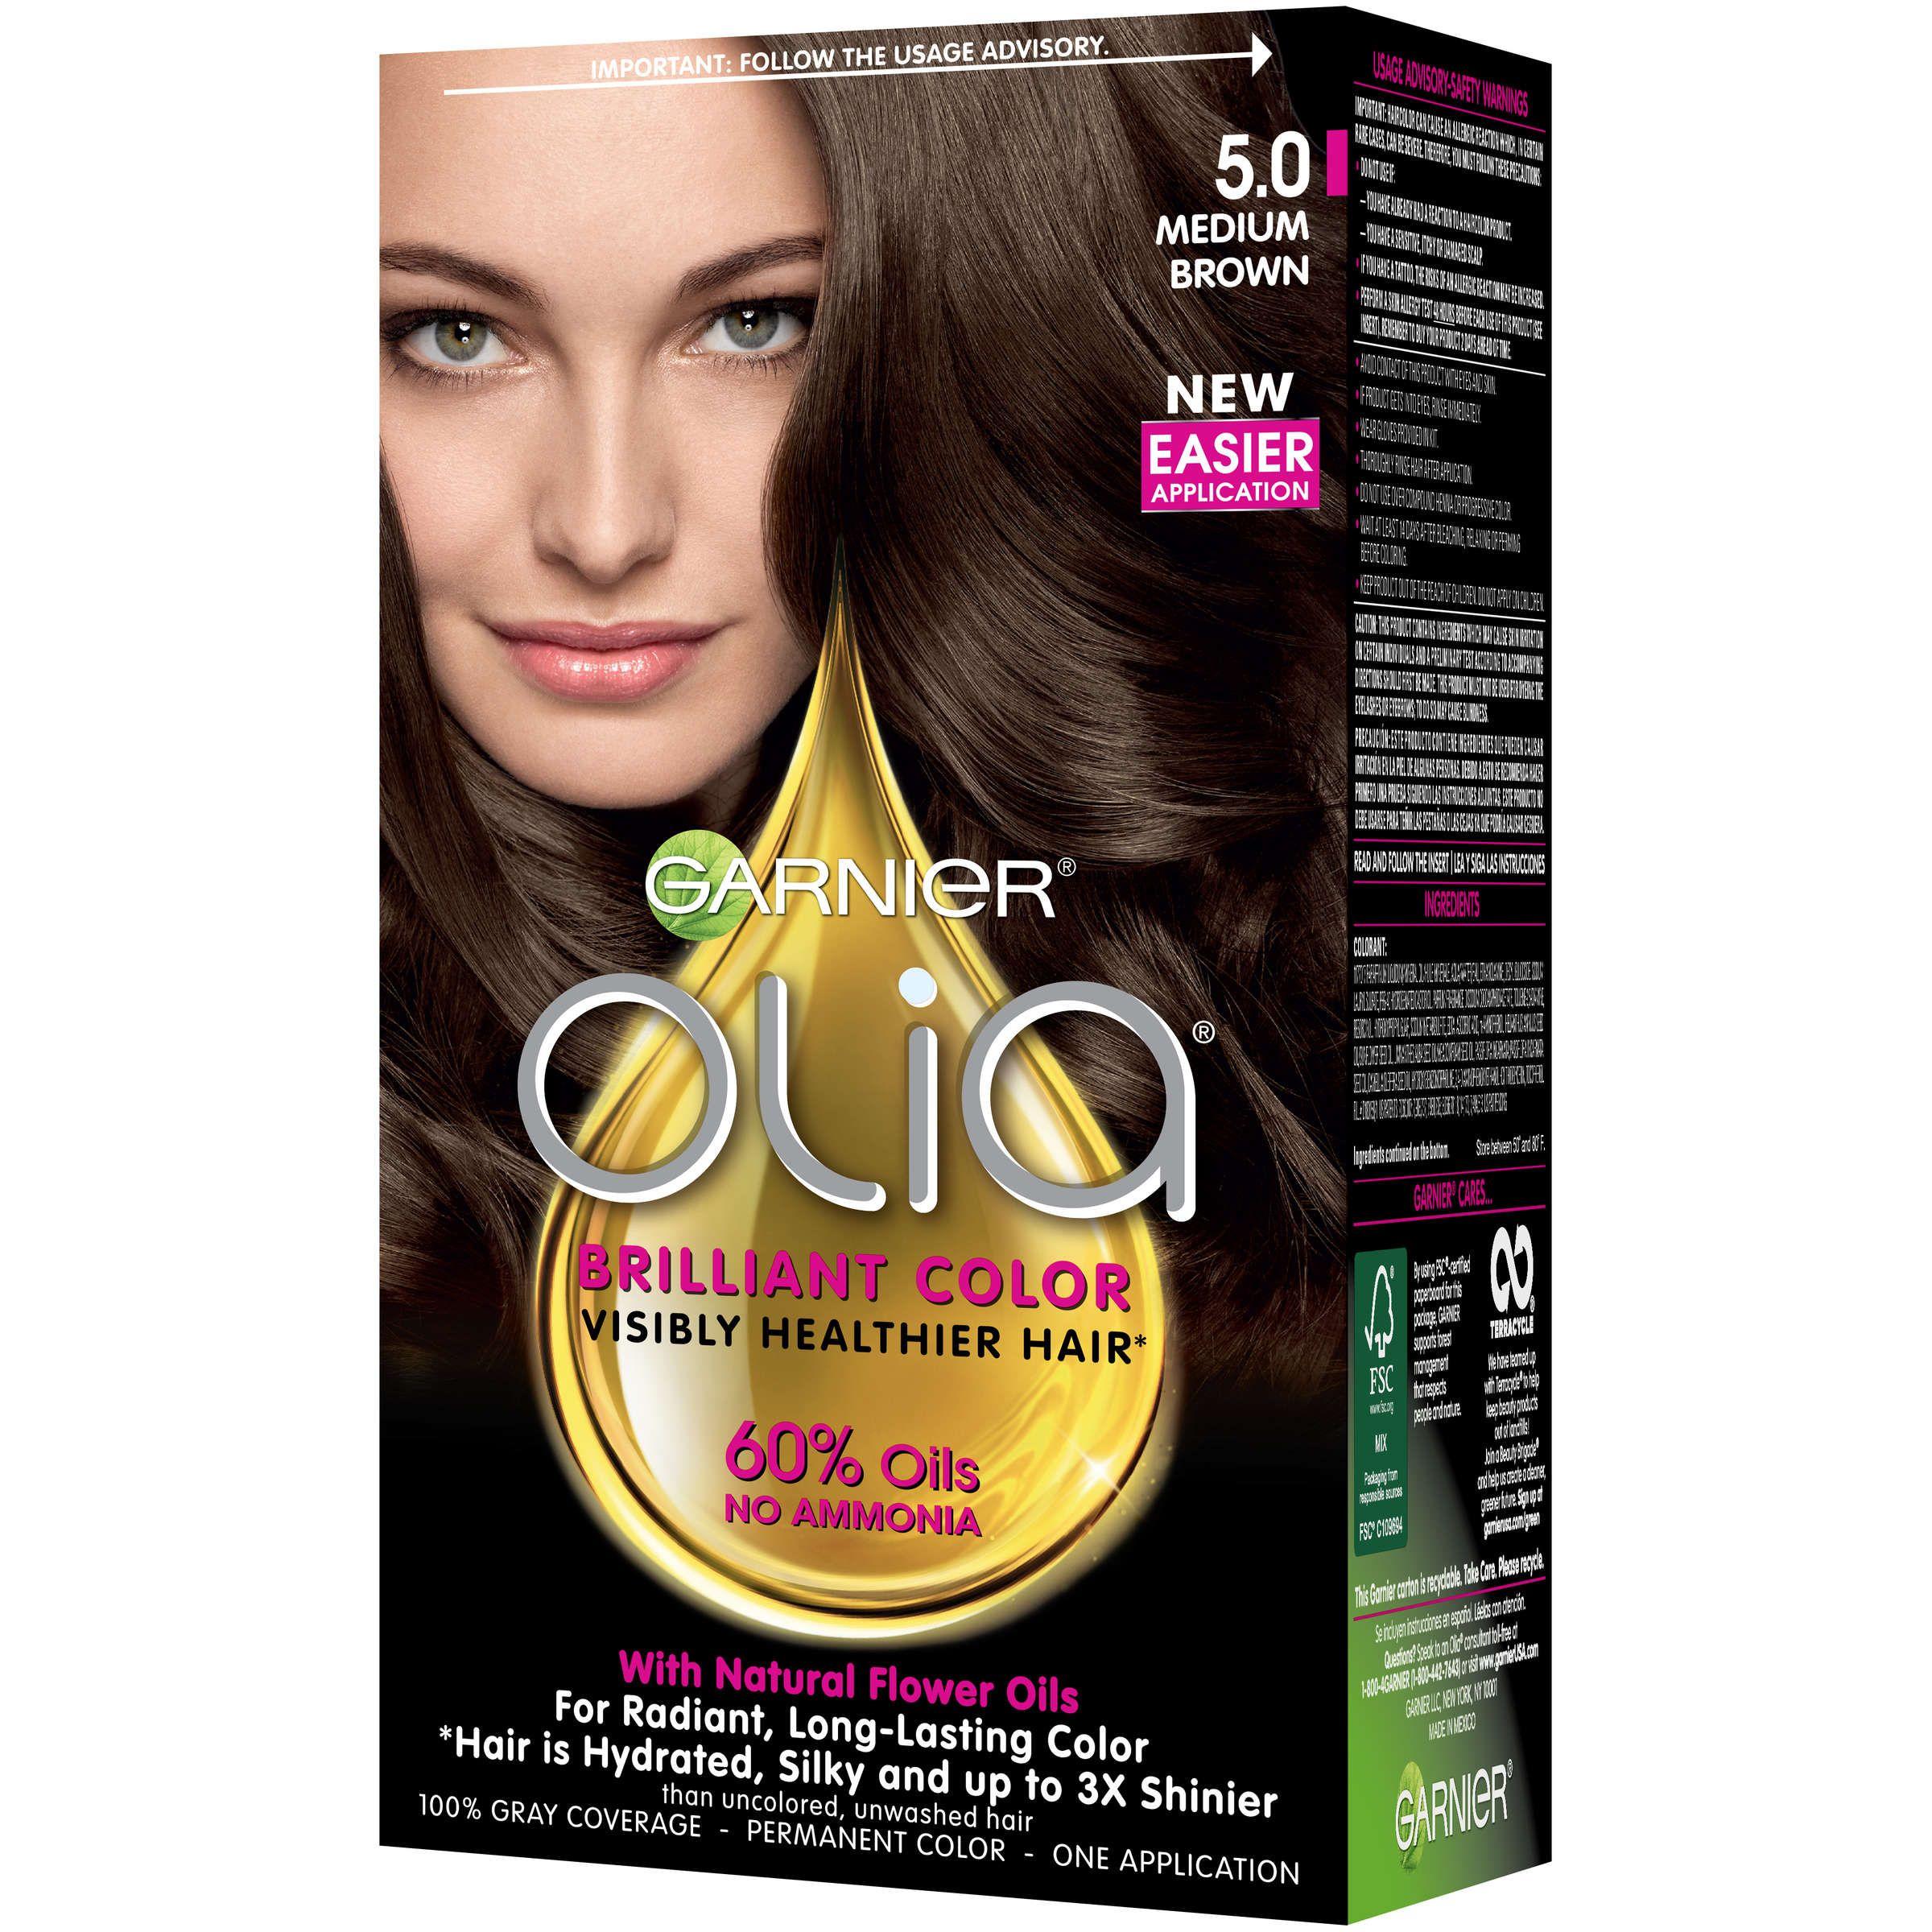 Garnier Olia Oil Powered Permanent Hair Color 6 0 Light Brown 1 Kit Walmart Com Garnier Olia Olia Hair Color Permanent Hair Color